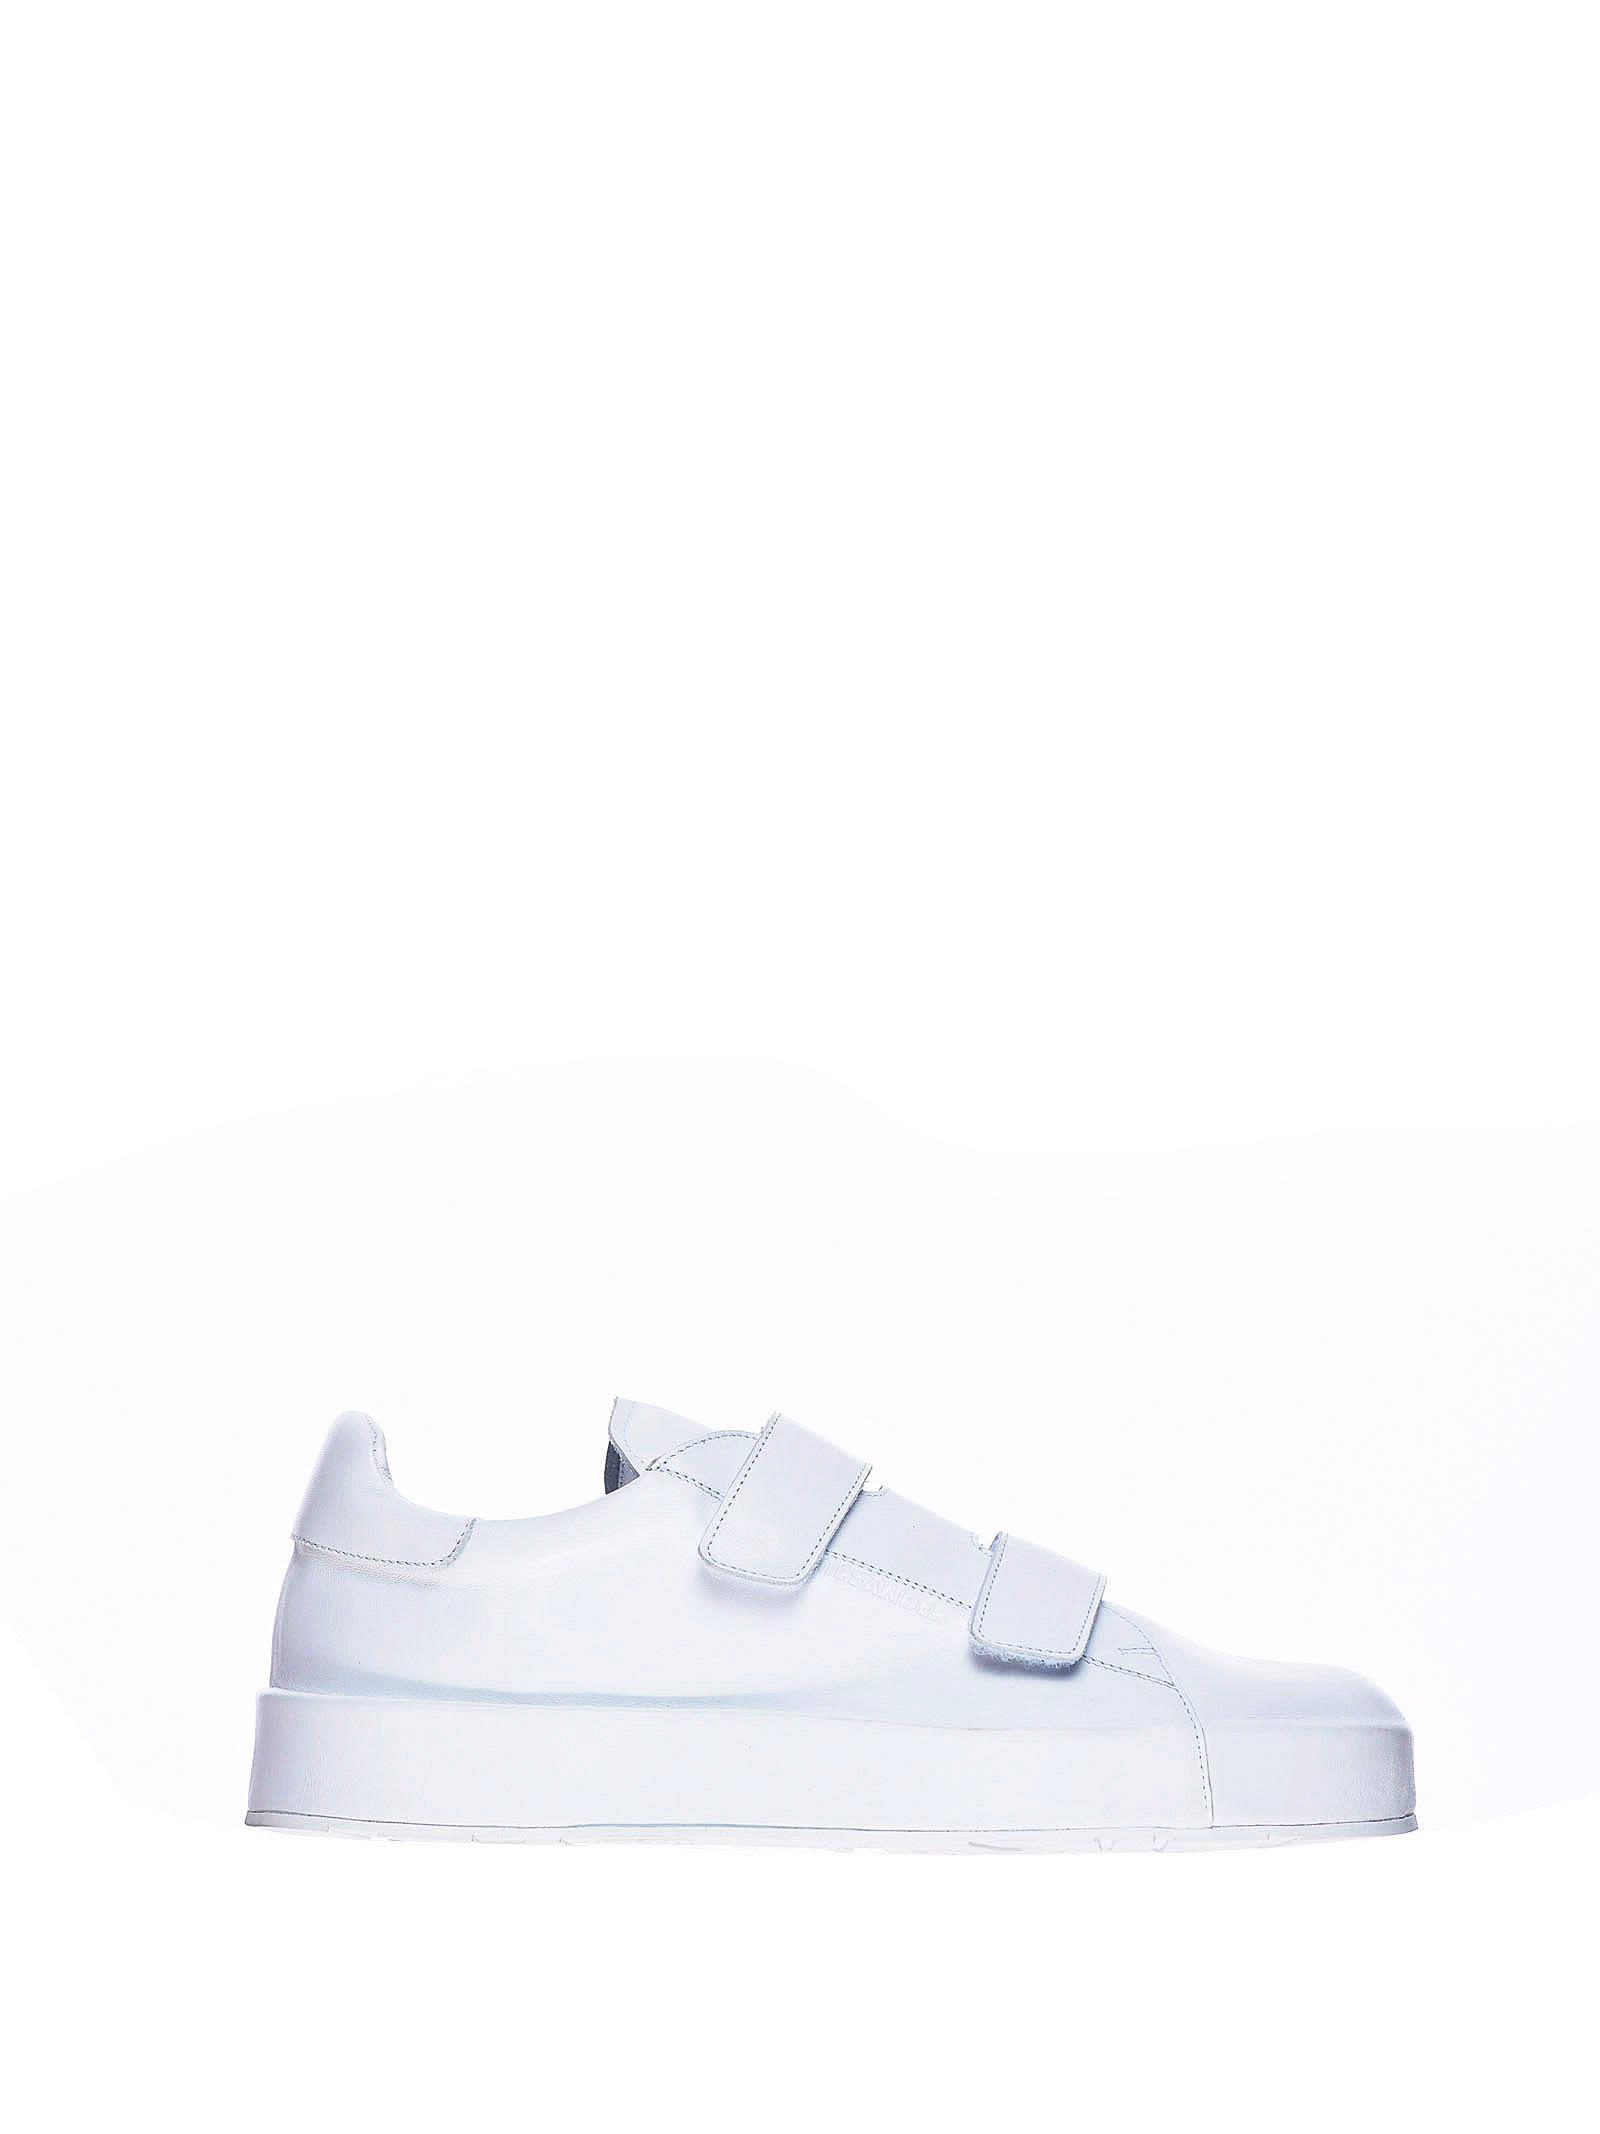 Jil Sander Sneaker White